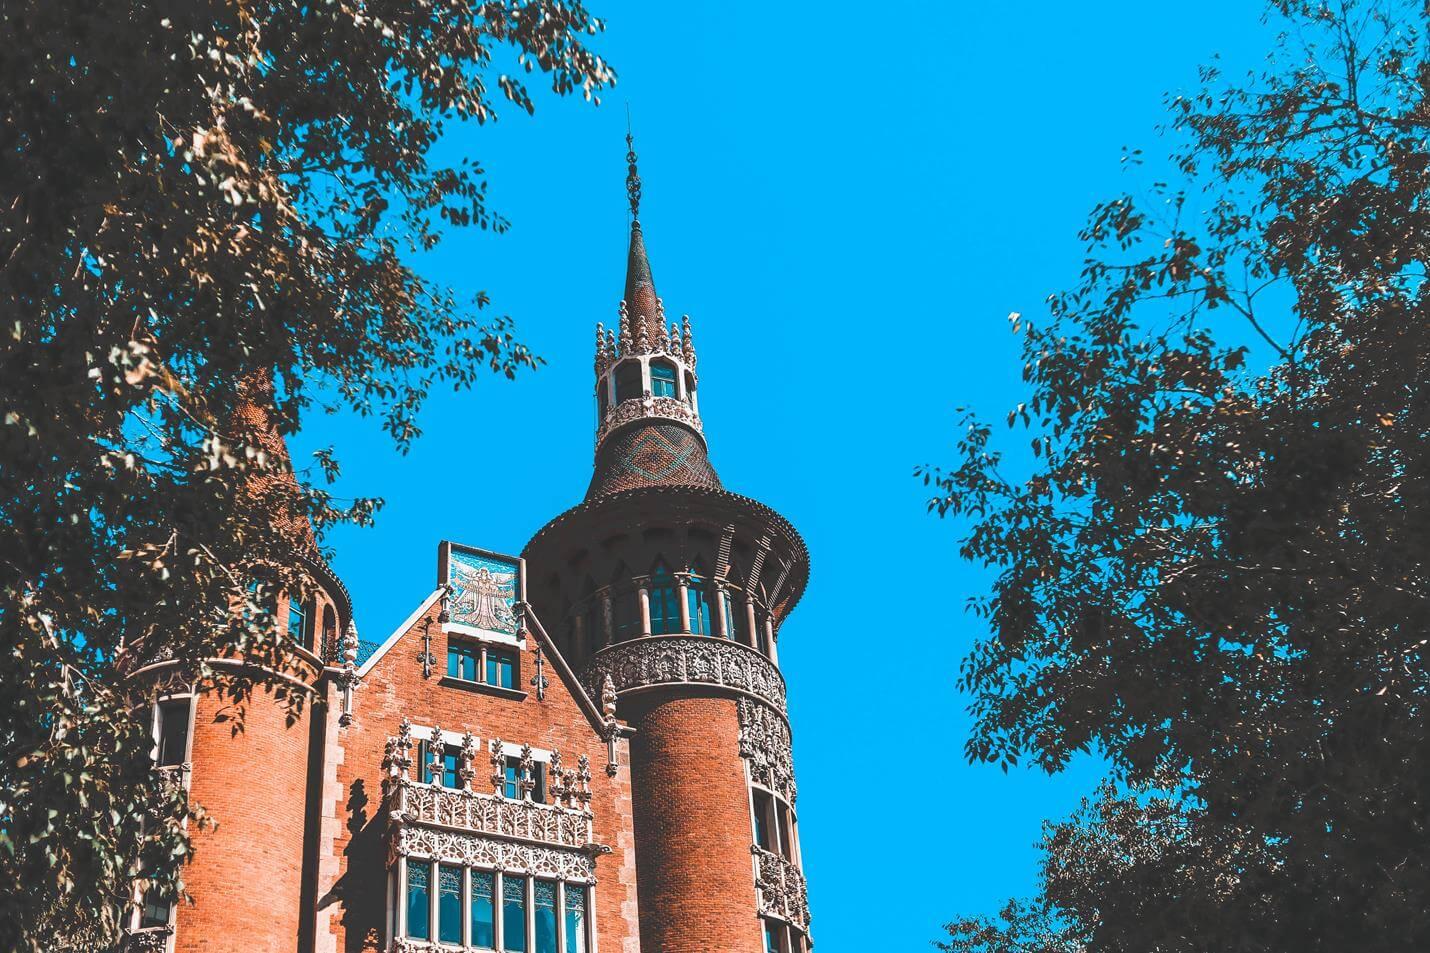 Casa de les Punxes in Barcelona - Top